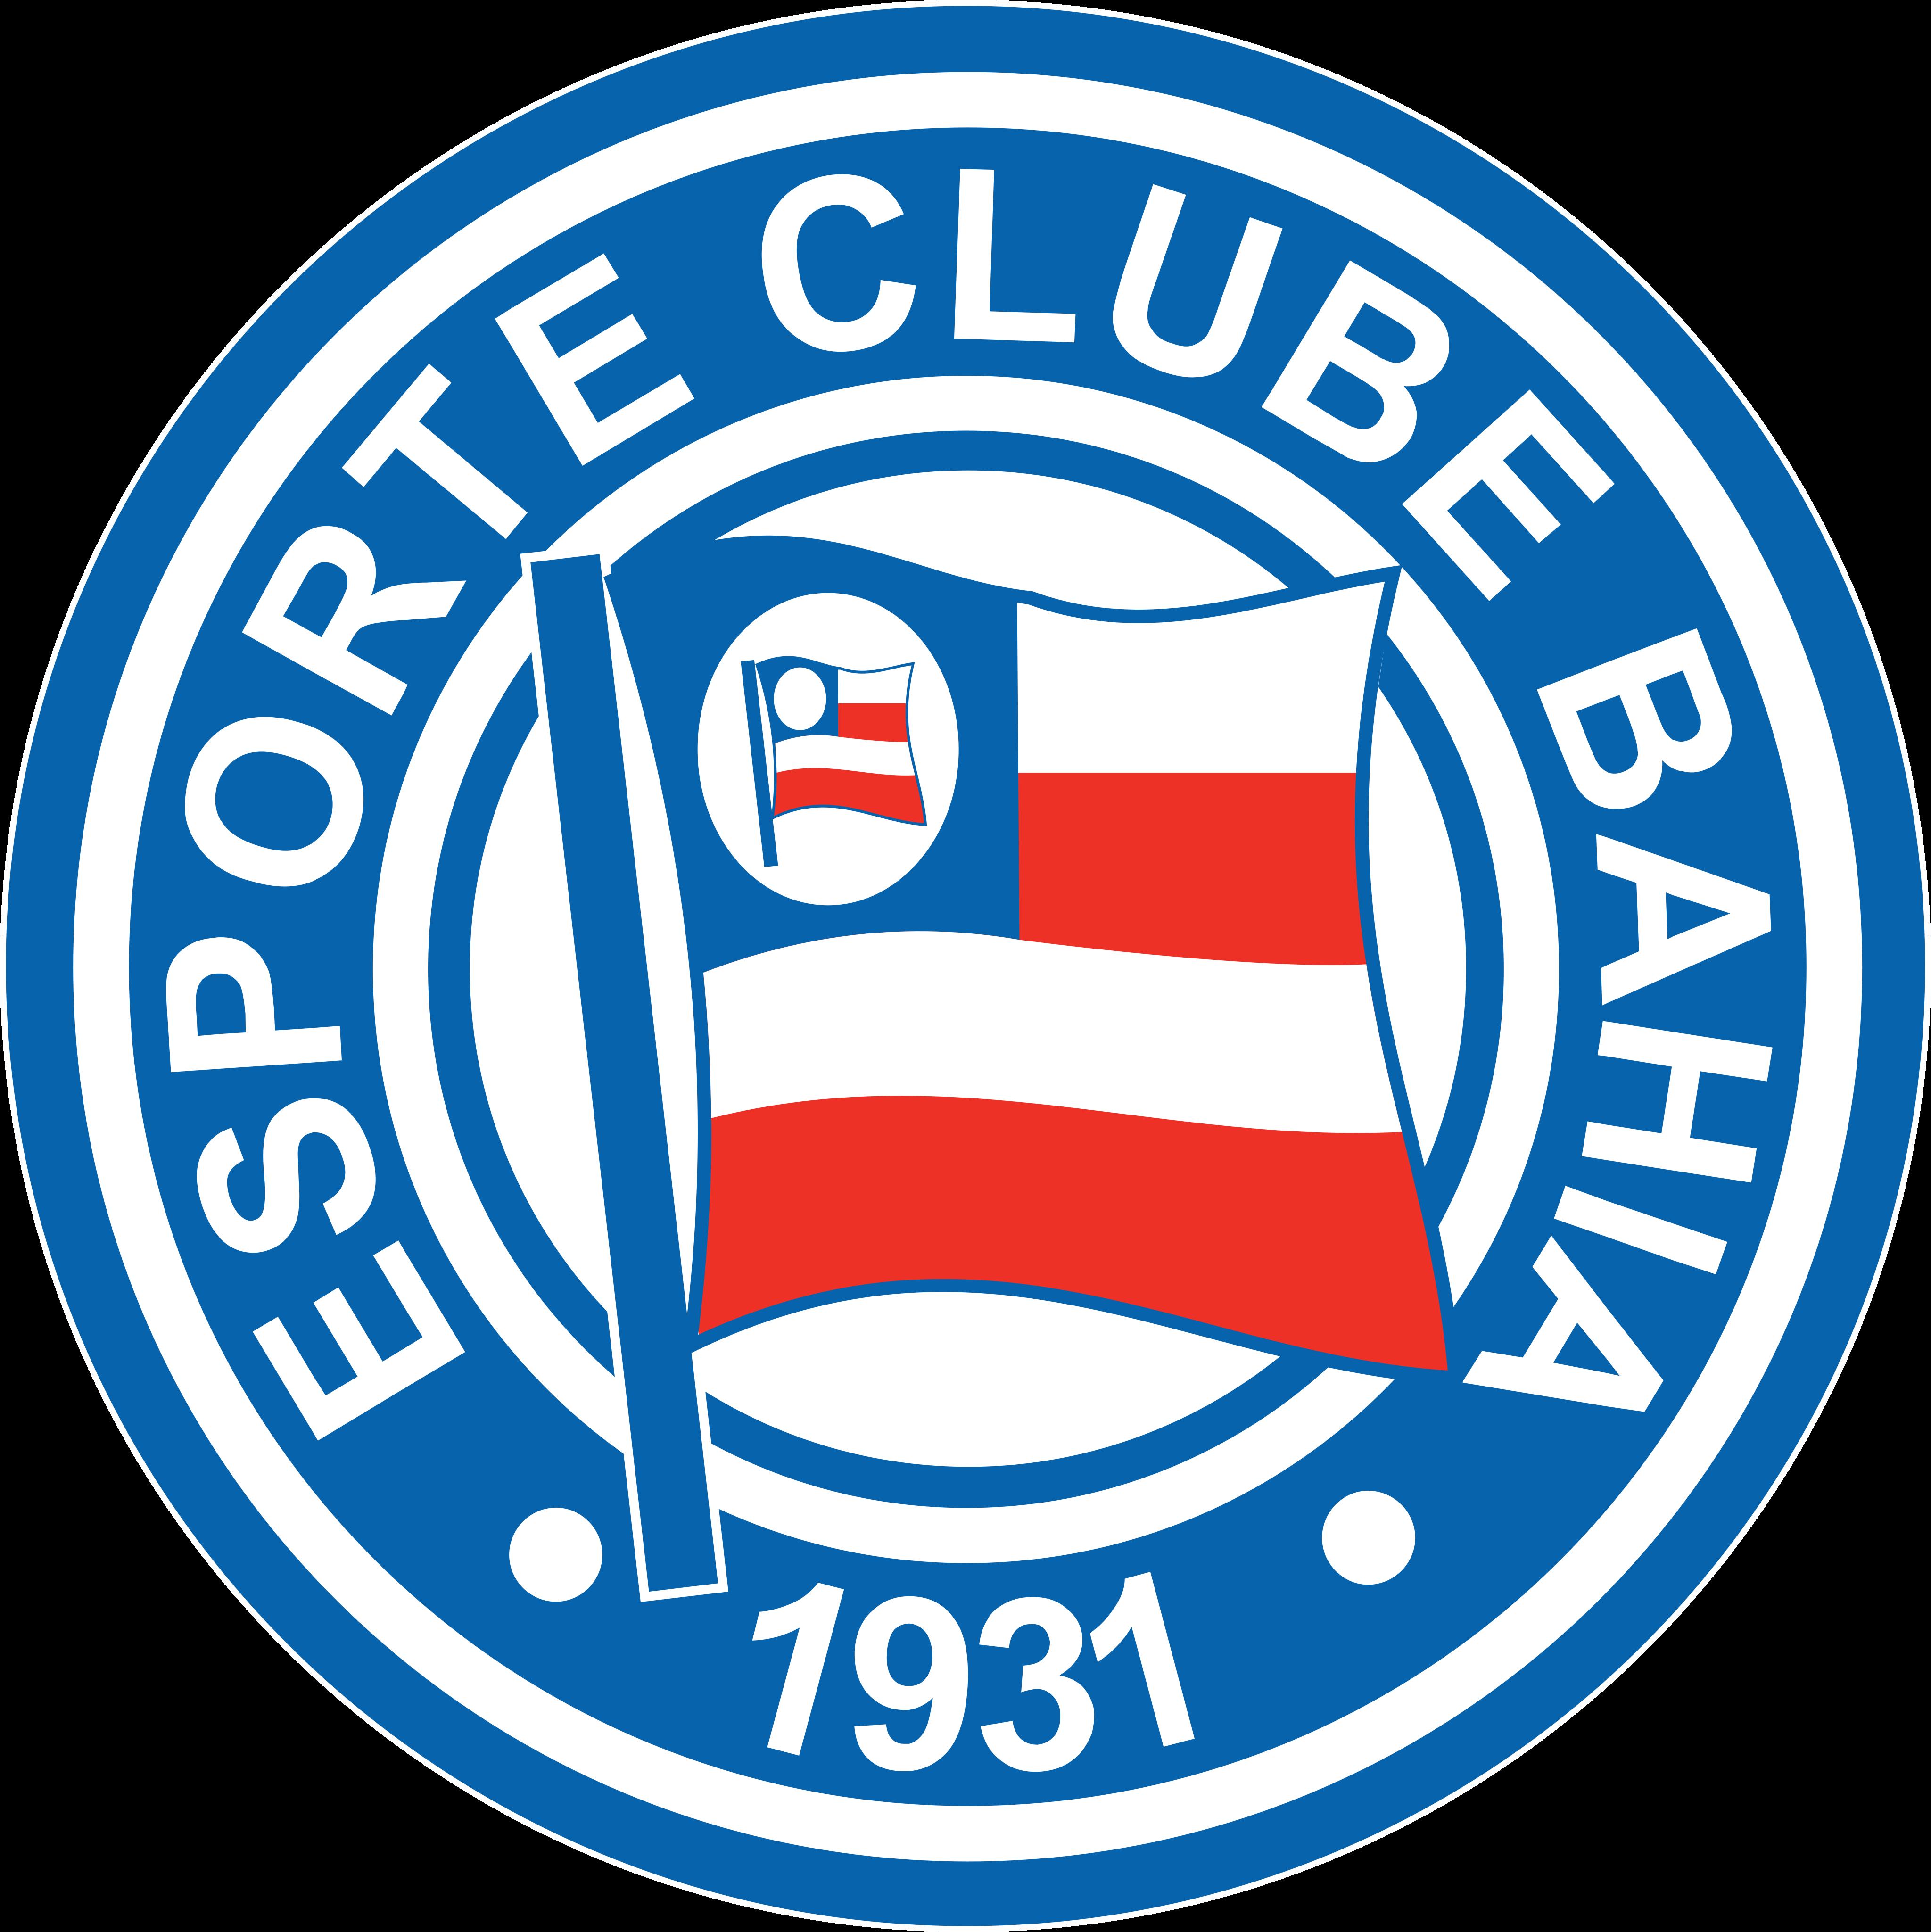 bahia ec logo 01 - E C Bahia Logo